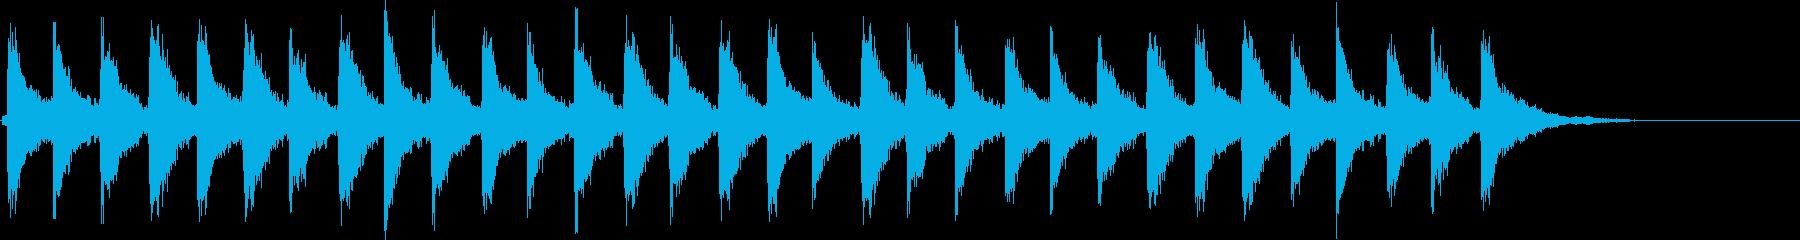 Xmasシーンに最適な鈴の音(速め)の再生済みの波形